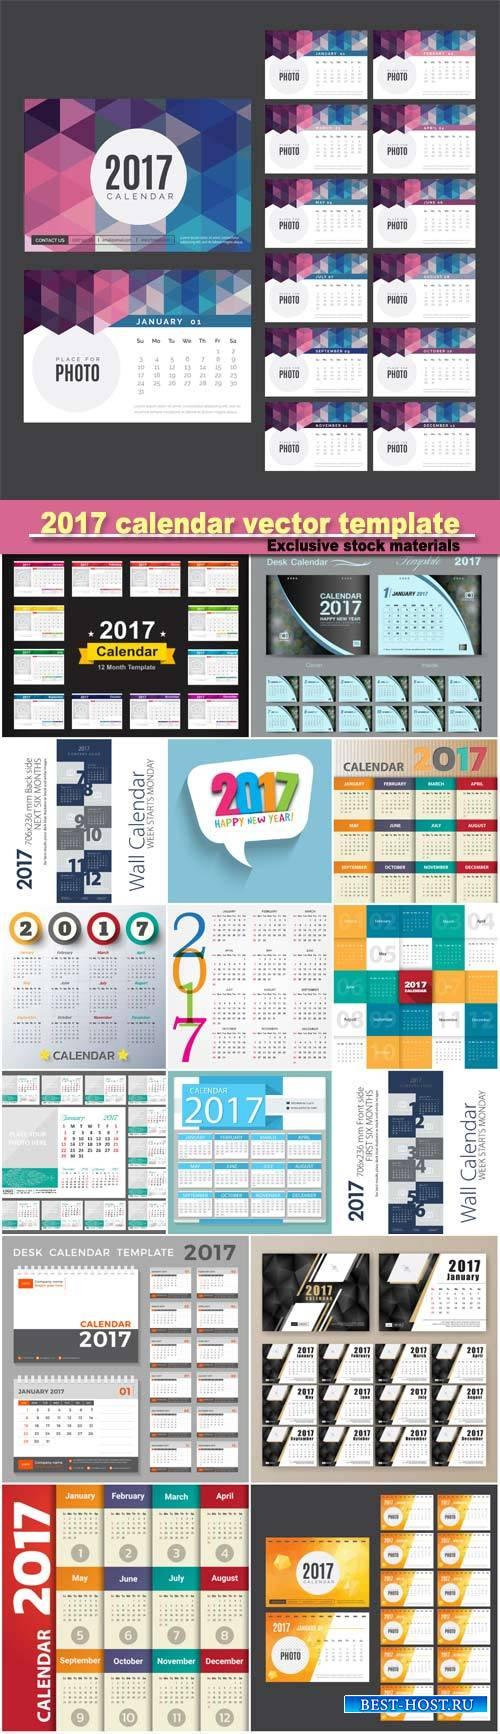 2017 calendar vector template